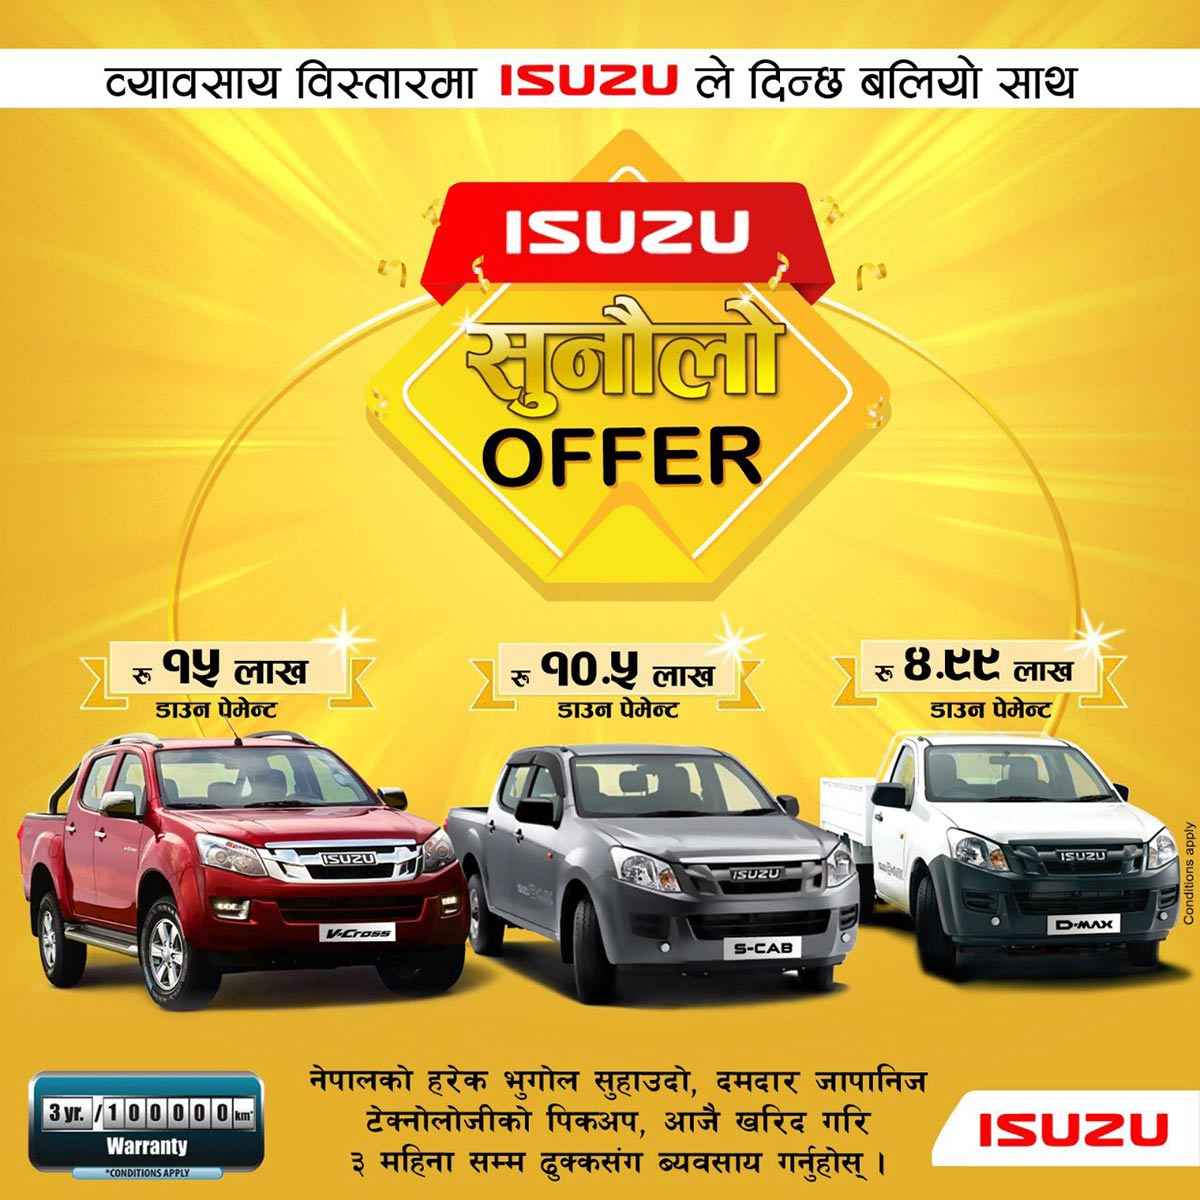 Isuzu Times Motors Post Lockdown Offer Image1